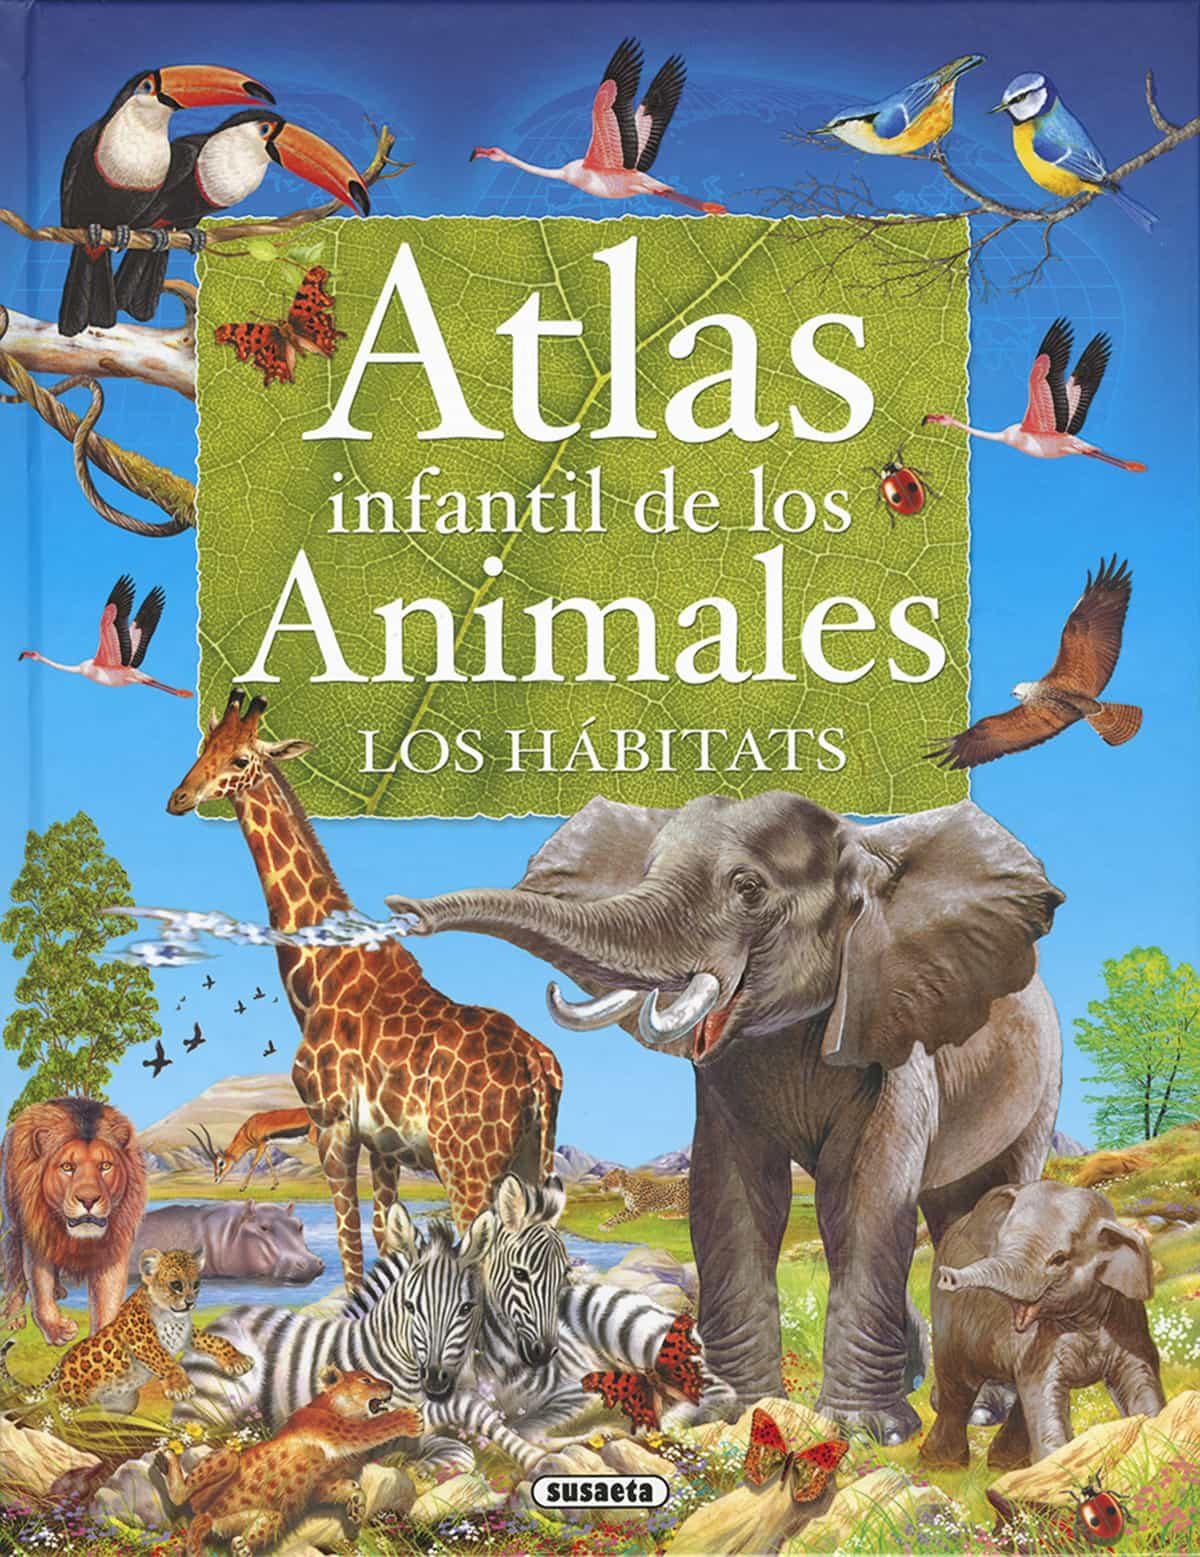 Atlas Infantil De Los Animales por Vv.aa. Gratis